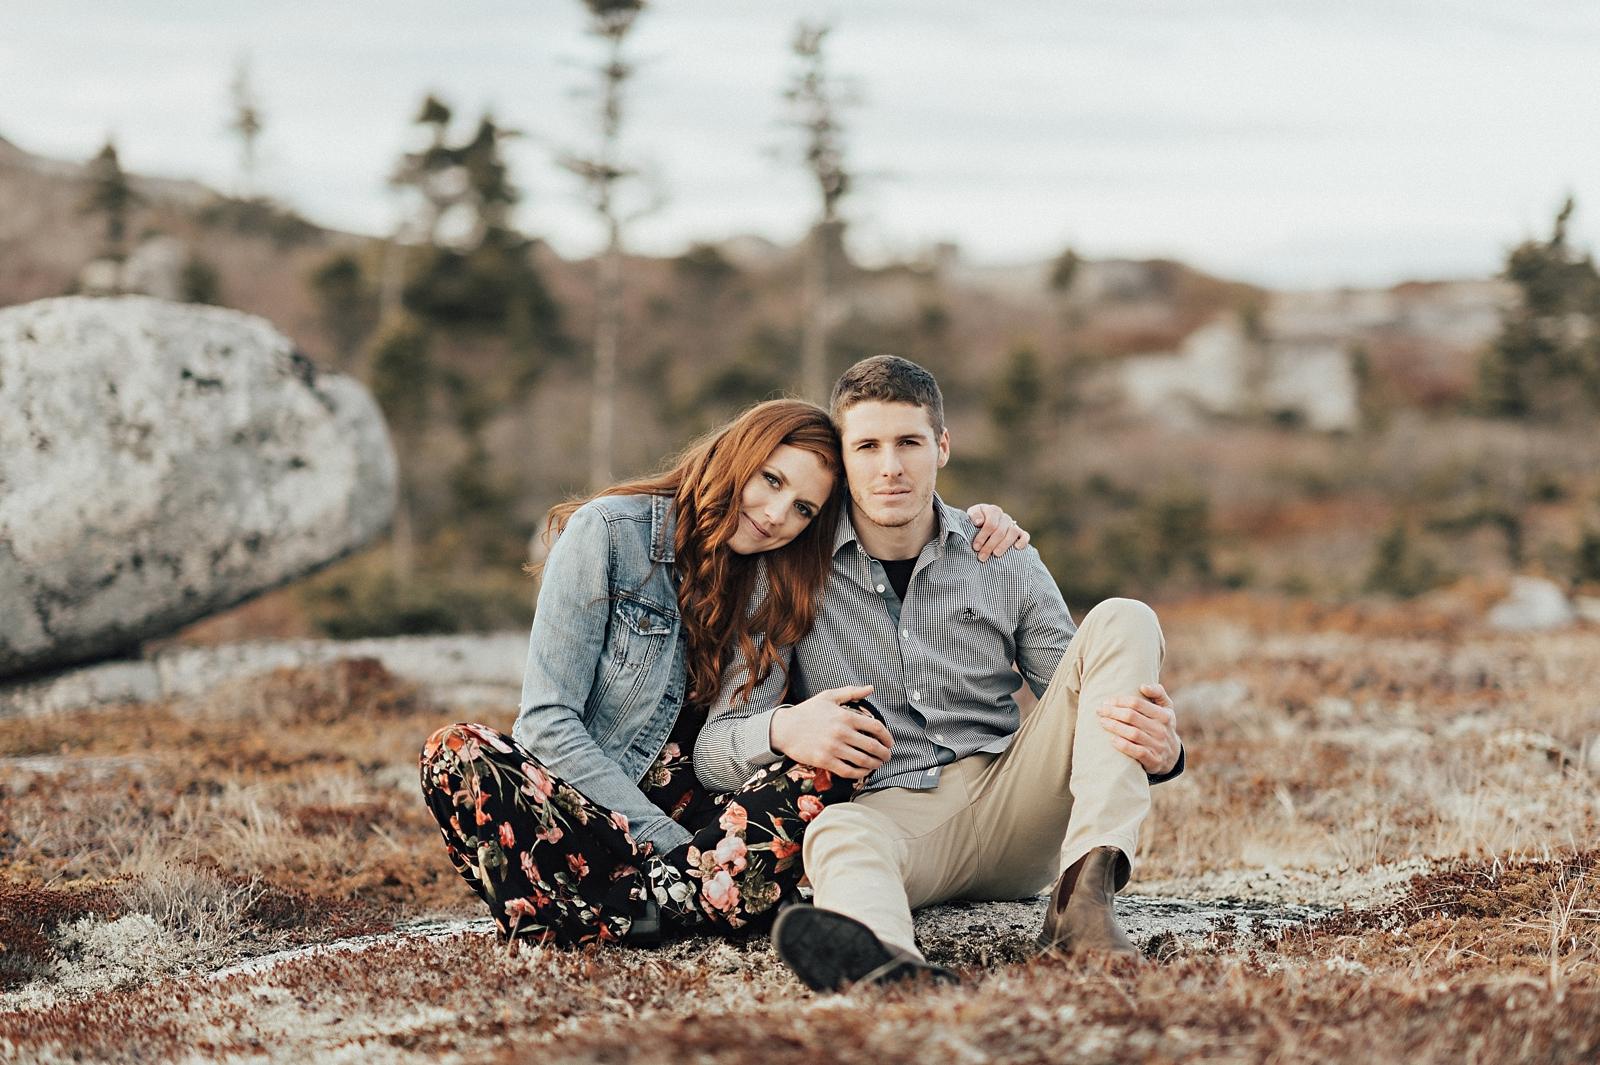 Halifax-Wedding-Photographer_Annie&Ryan_Ocean-Engagement-Shoot_38.jpg